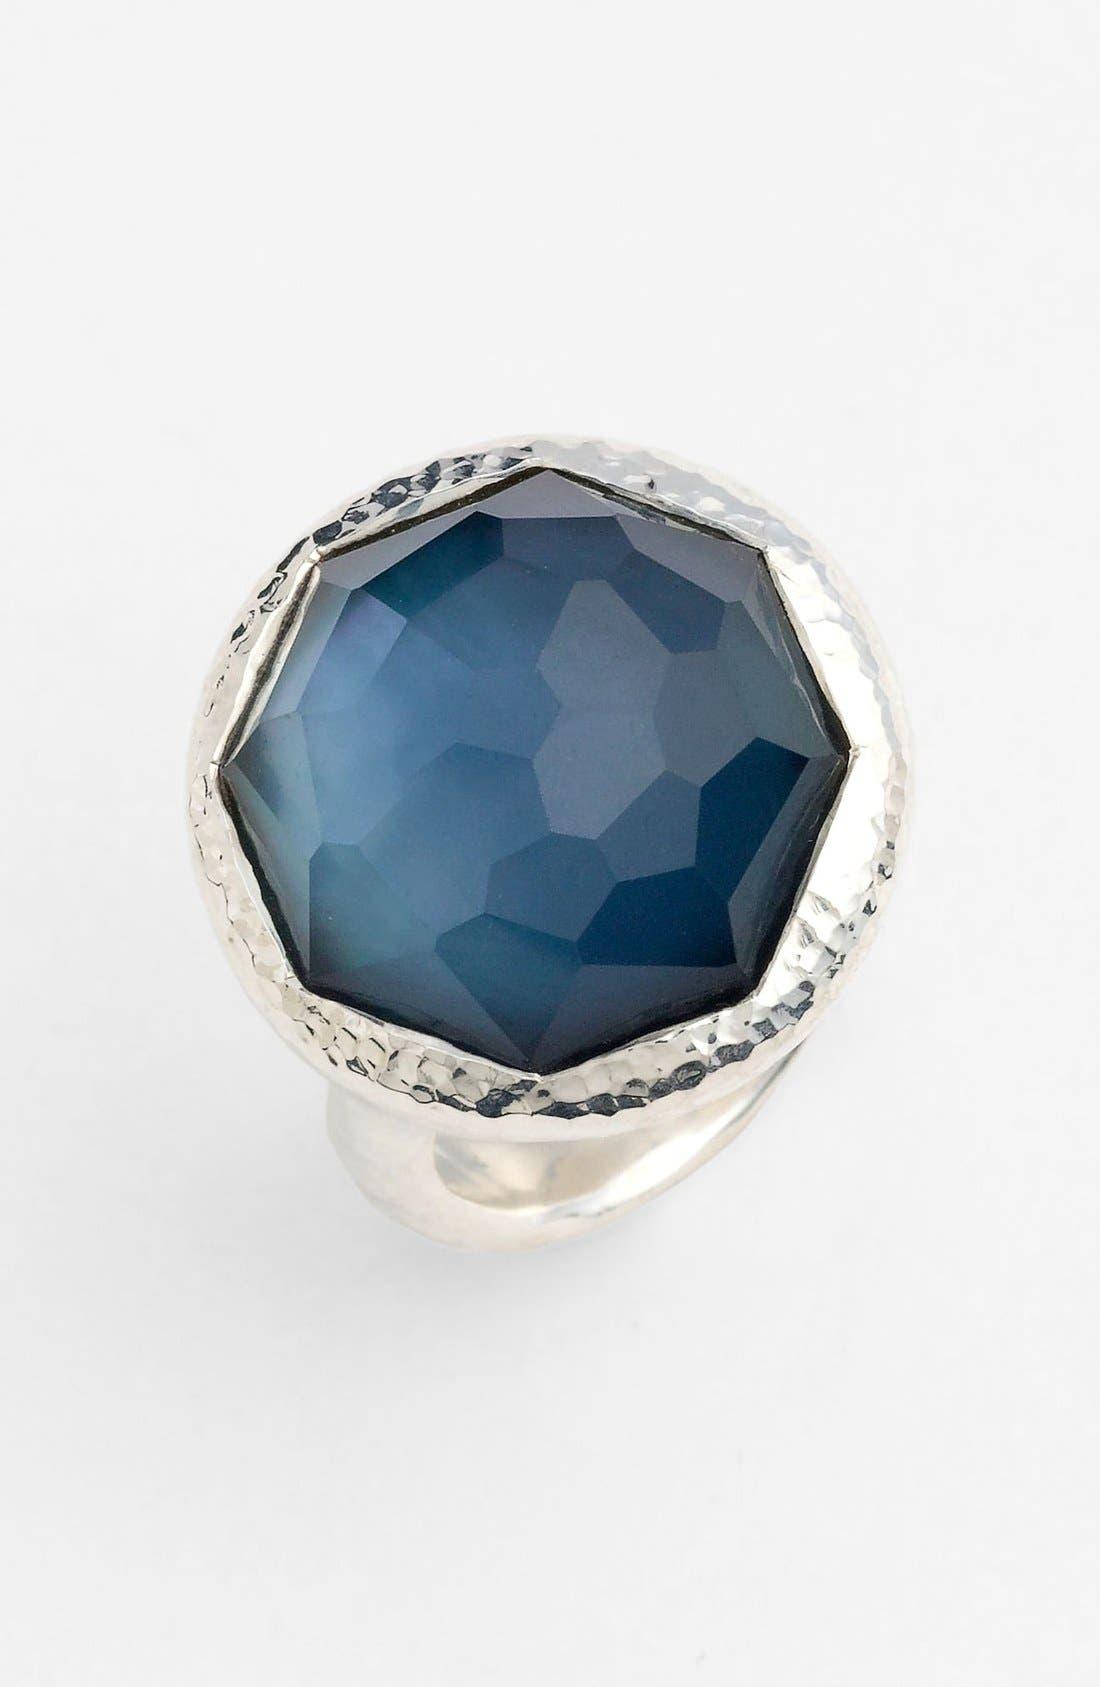 Main Image - Ippolita 'Wonderland' Doublet Ring